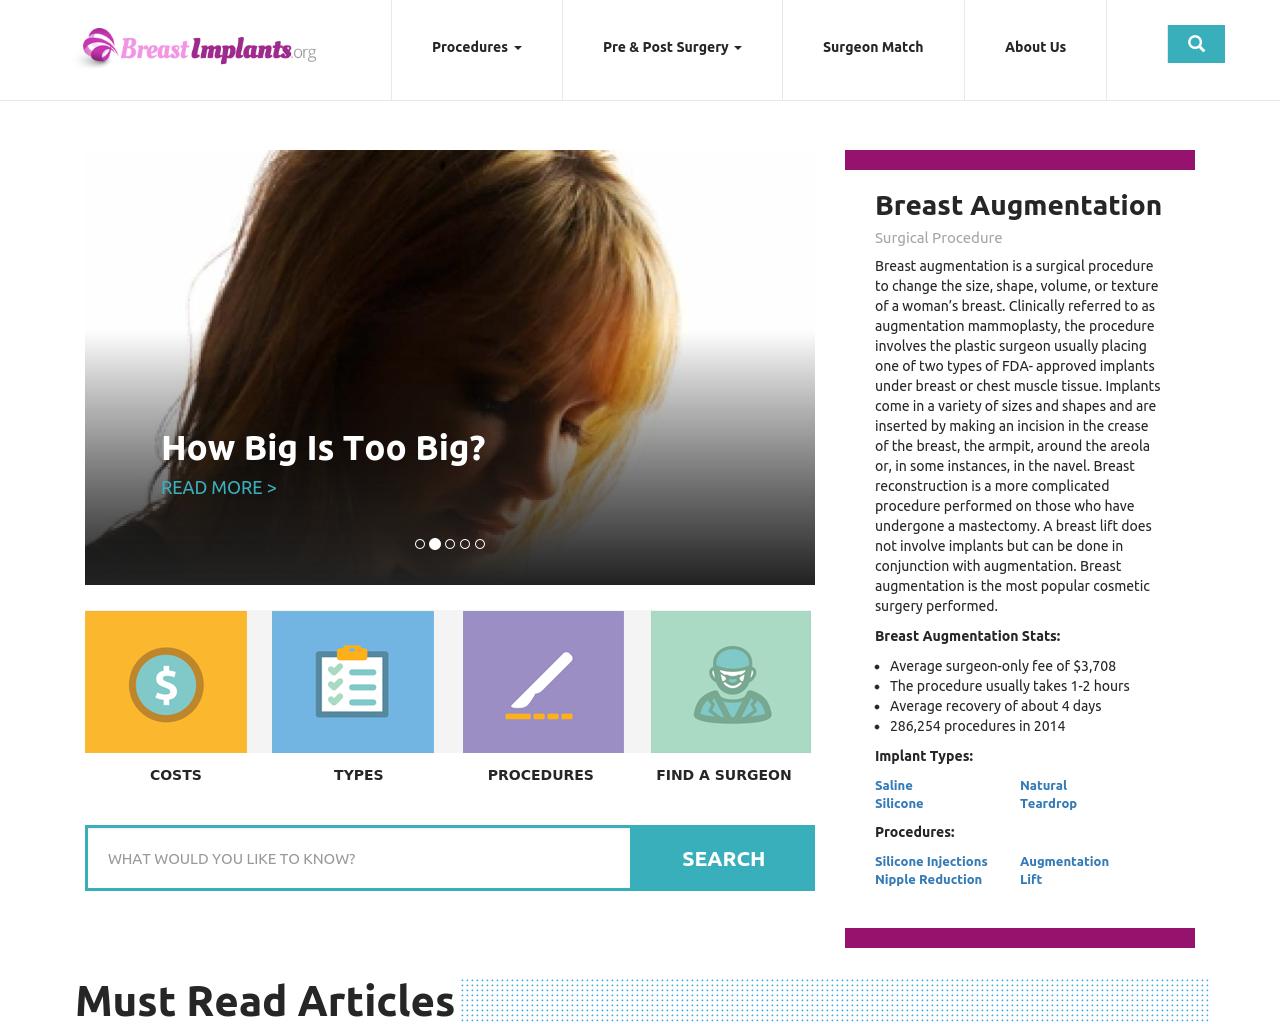 BreastImplants.org-Advertising-Reviews-Pricing